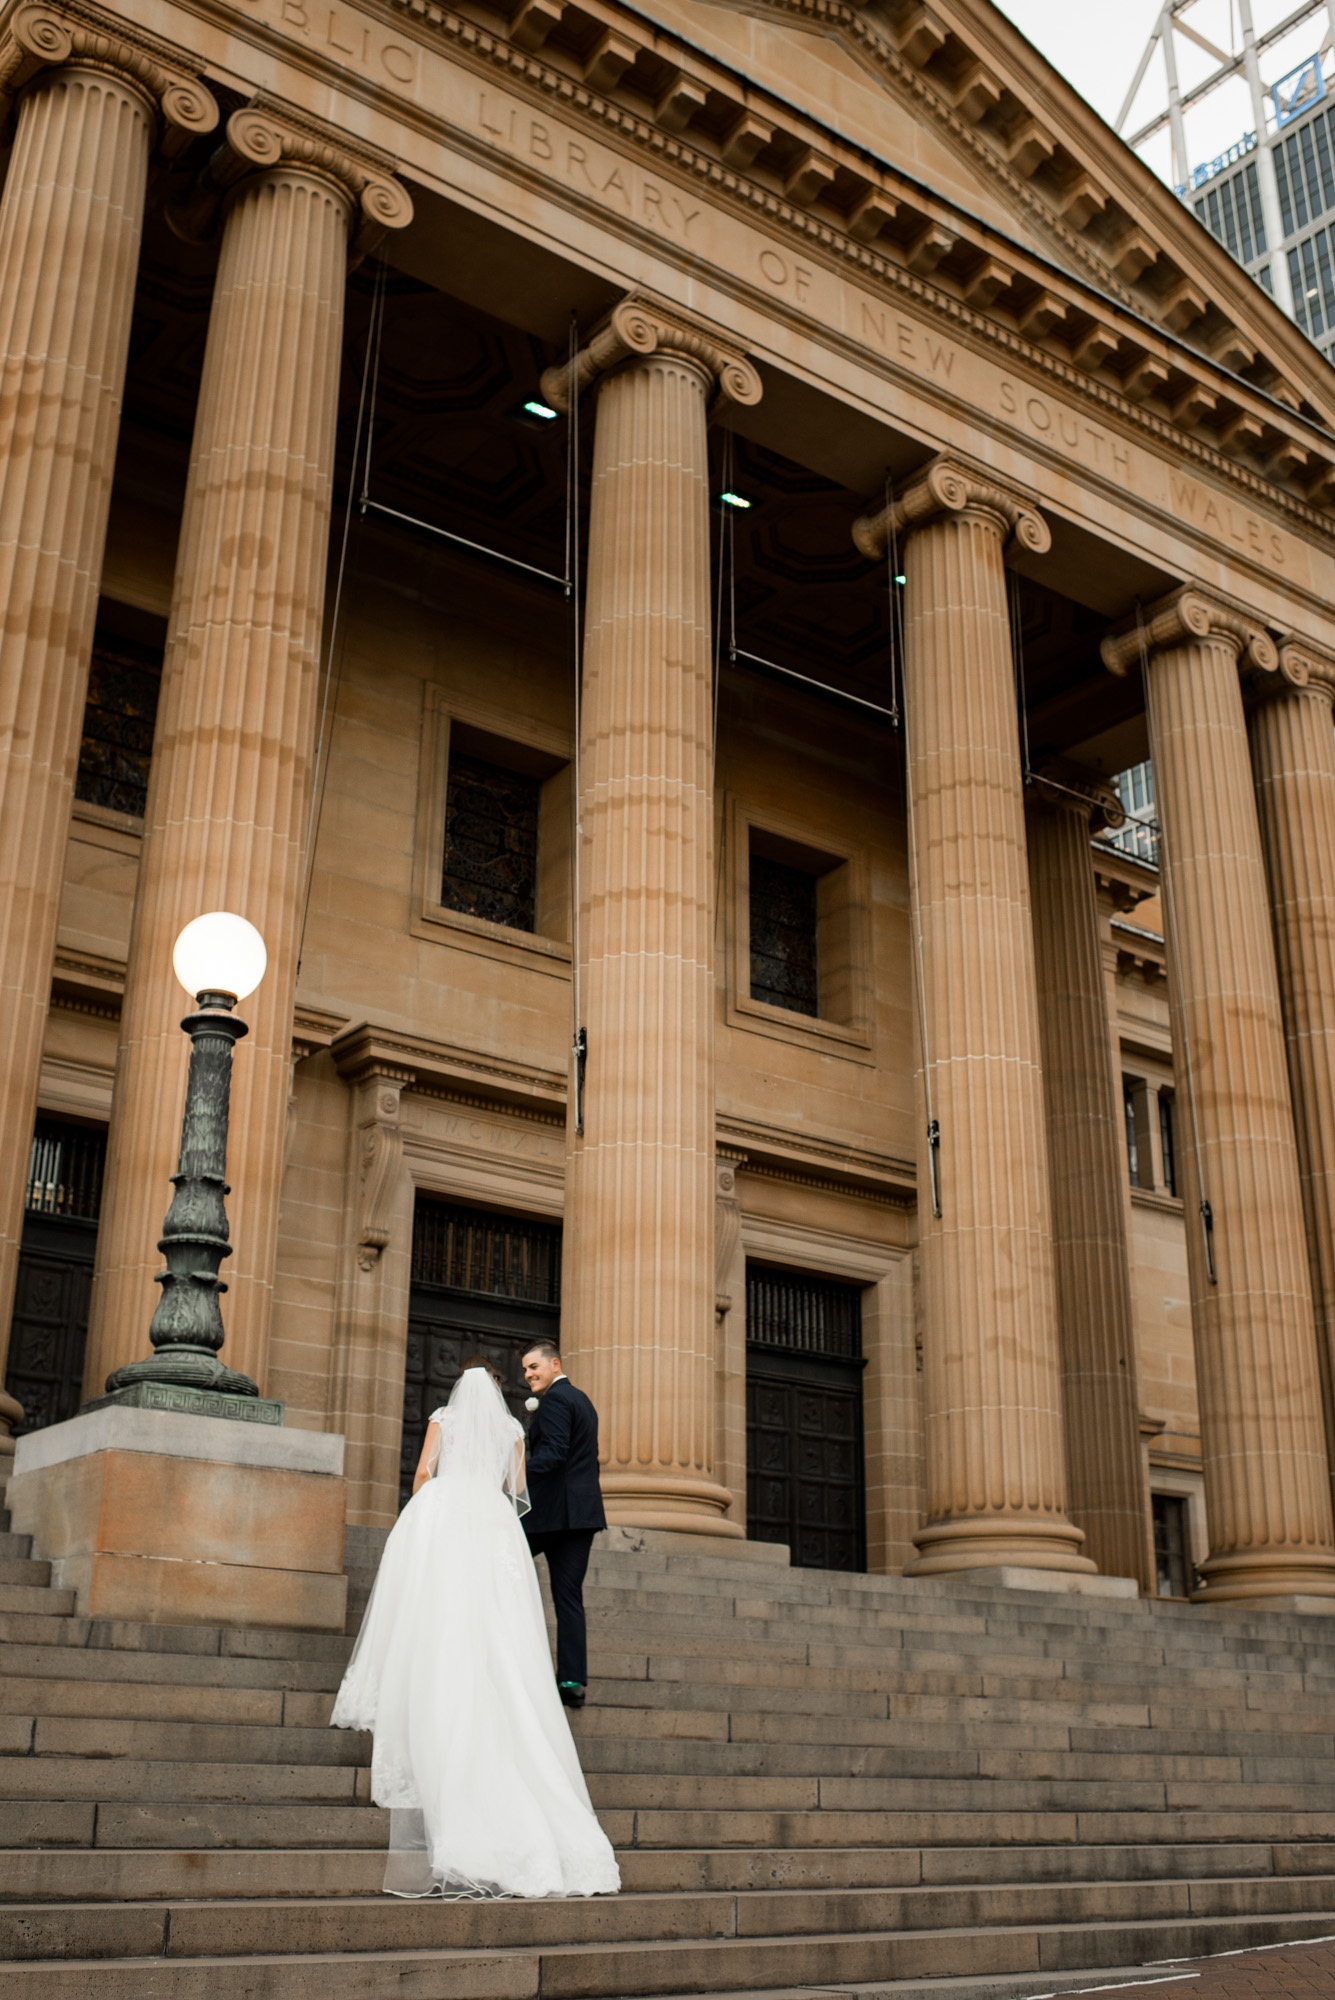 SEAN + COURTNEY //   Mark Jay Photography   Sydney   Wedding